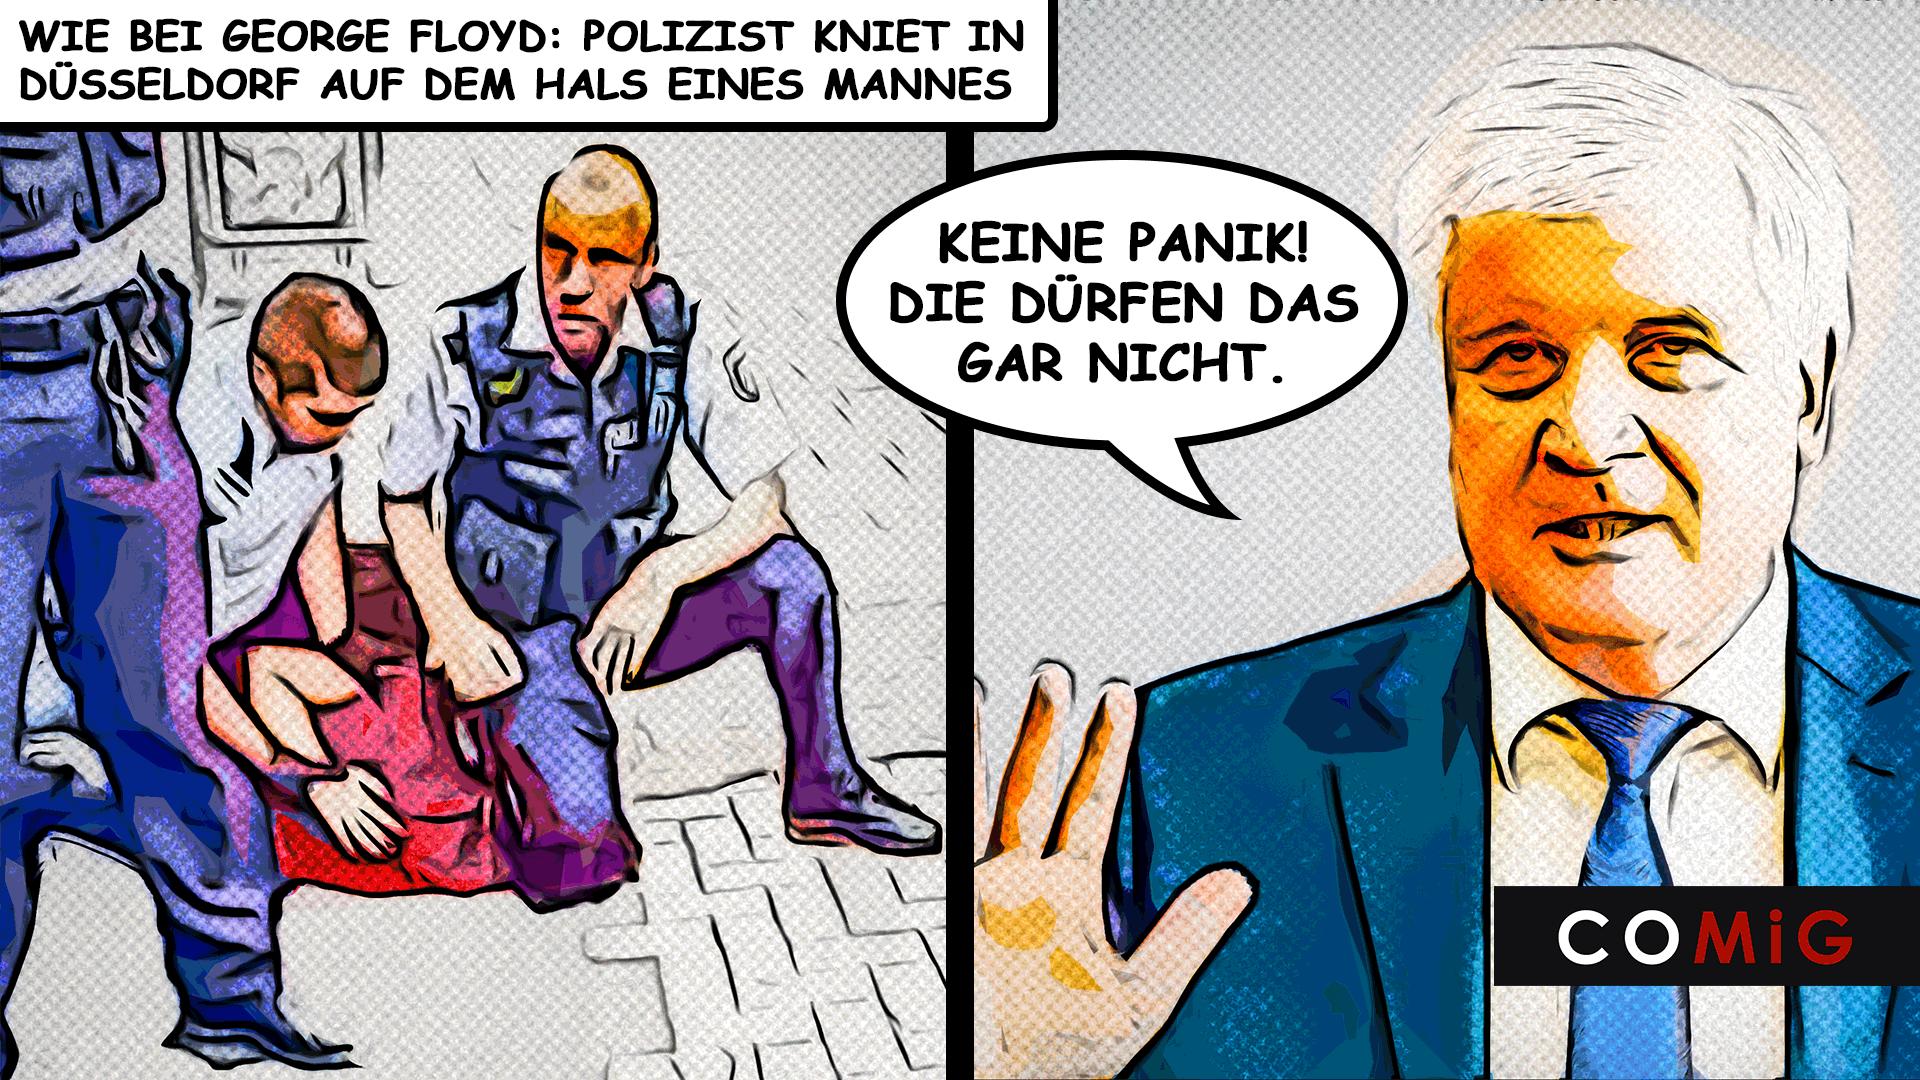 comig, Horst Seehofer, Rassismus, Studie, Racial Profiling, Polizei, Düsseldorf